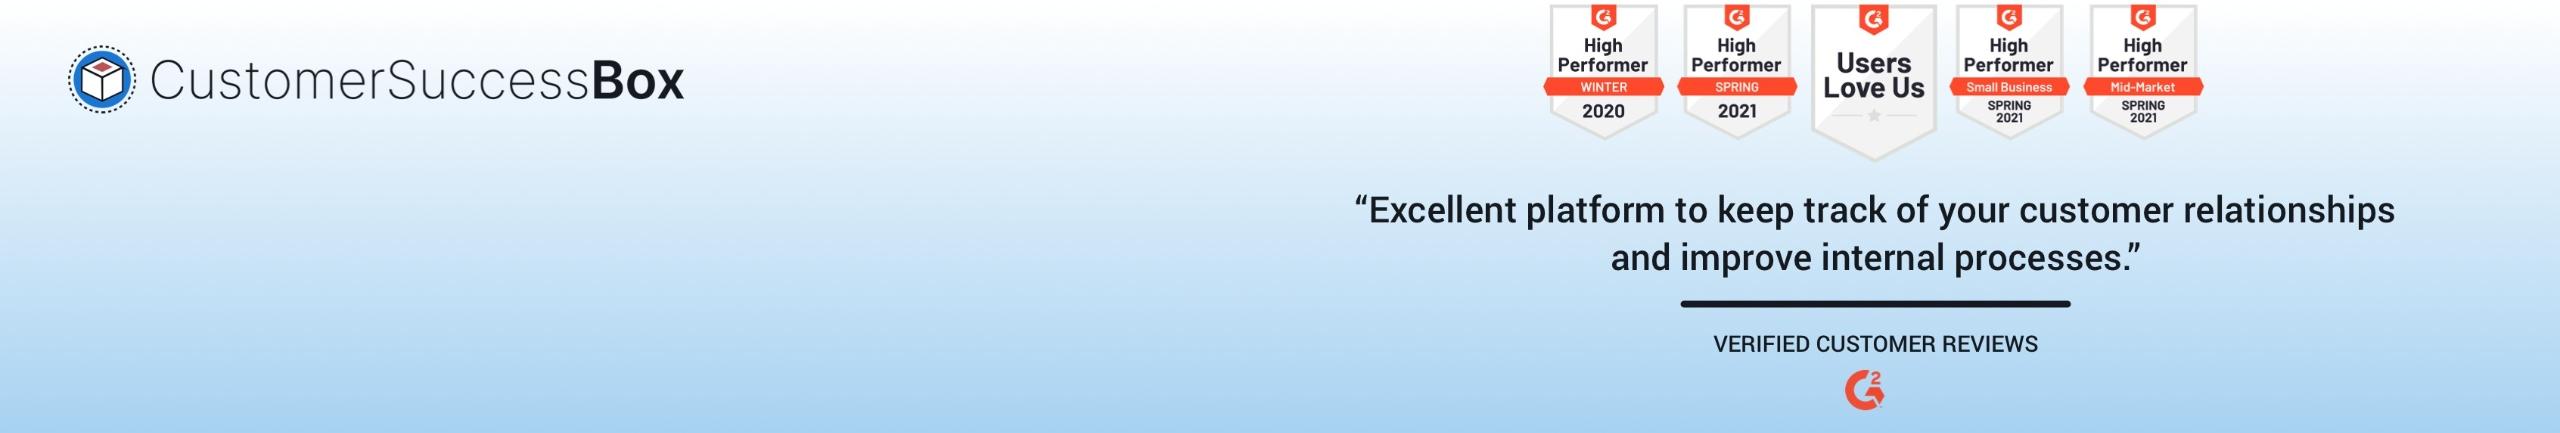 CustomerSuccessBox (@customersuccessbox00) Cover Image